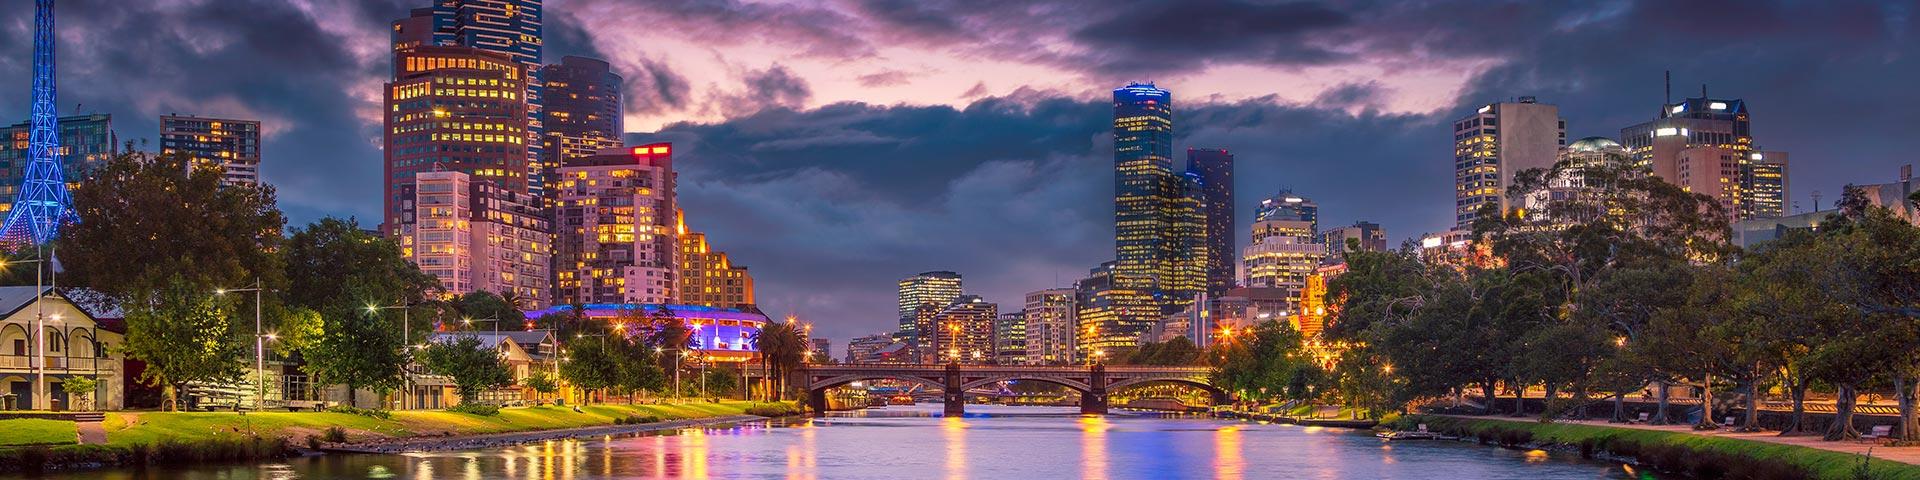 Melbourne hero